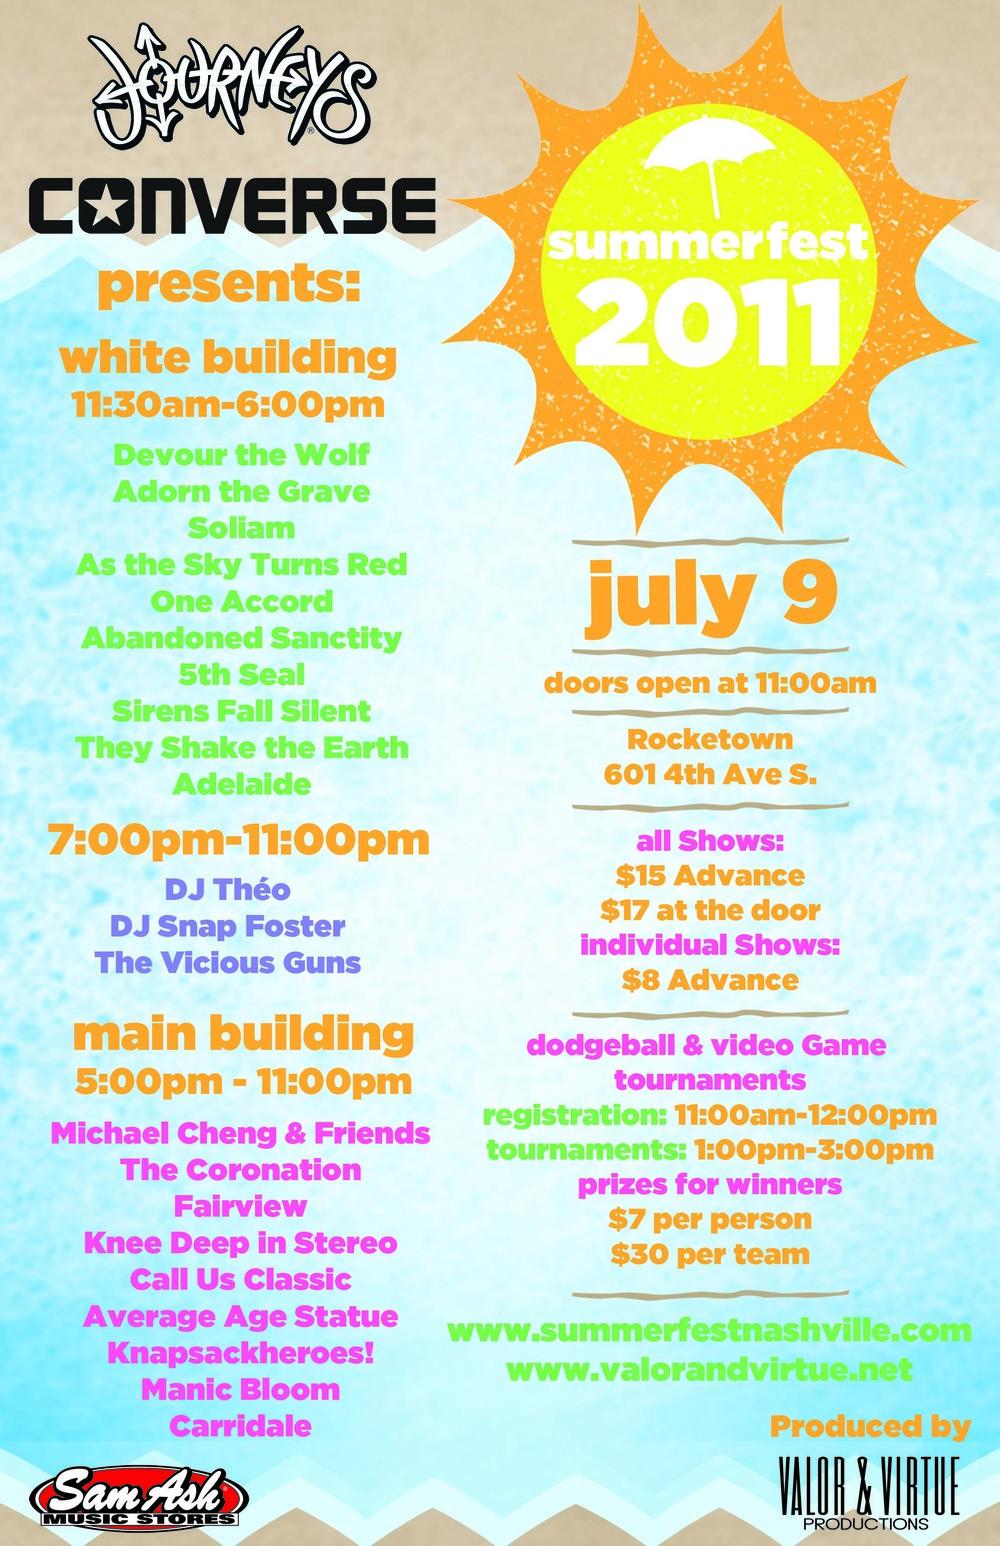 Summerfest 2011 Poster